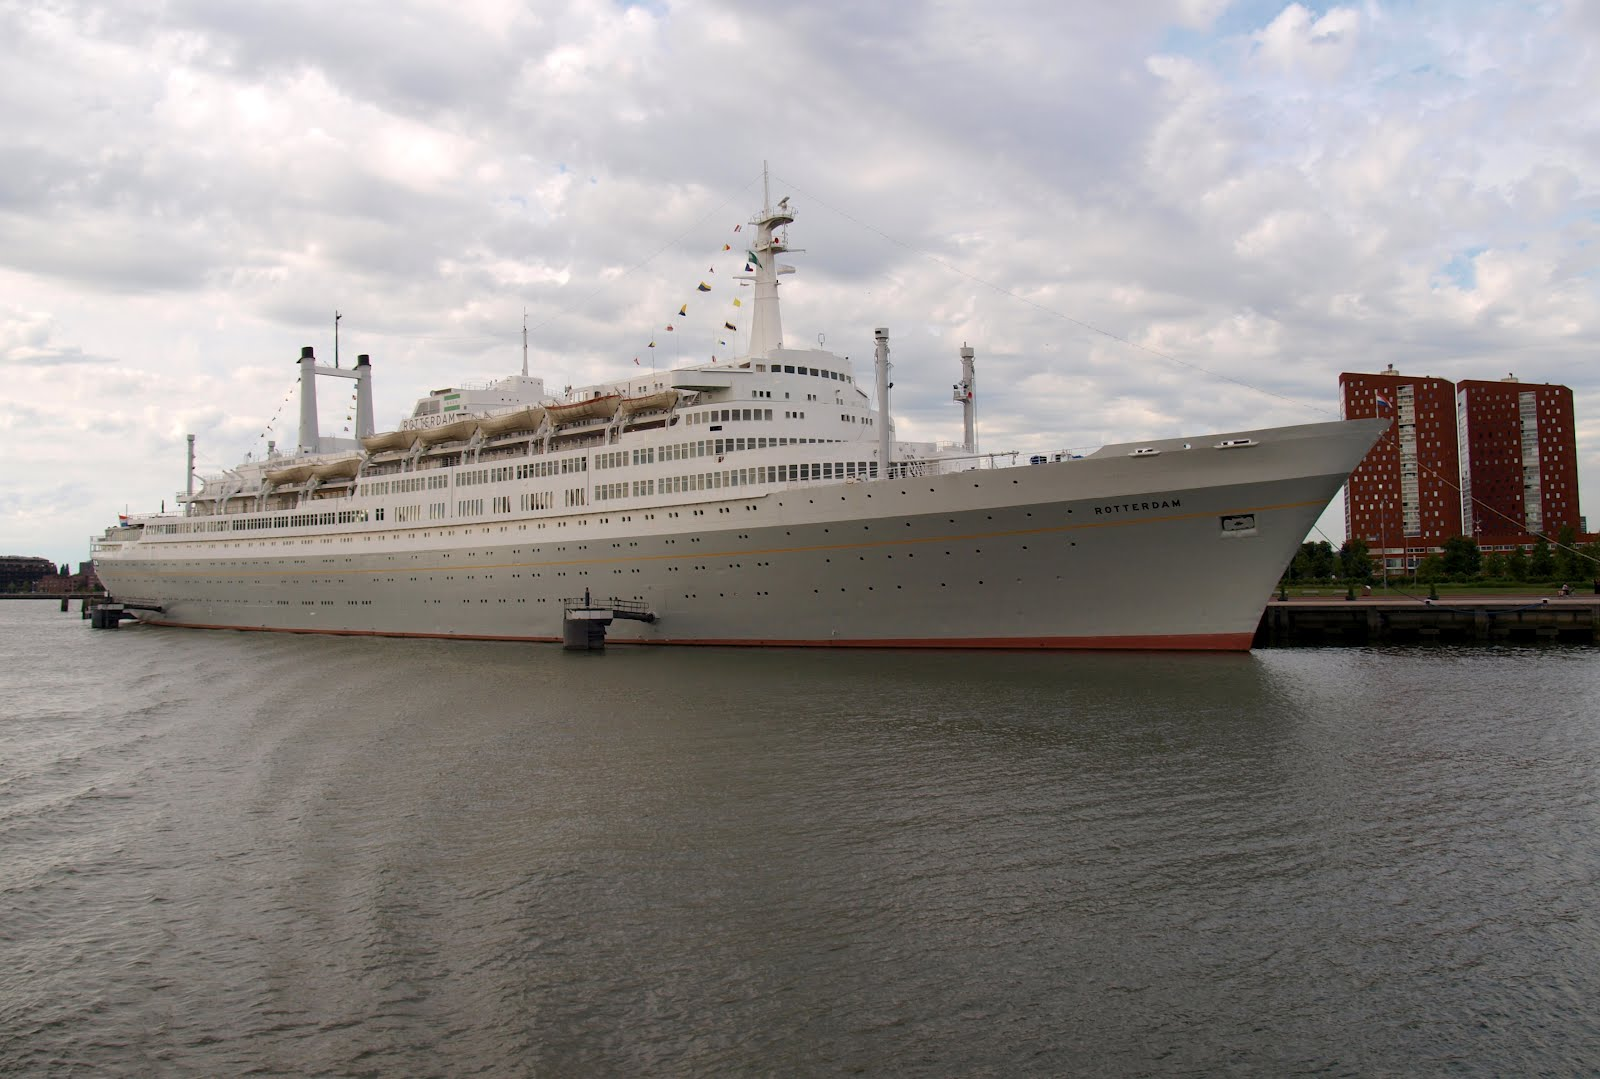 cruise schip rotterdam